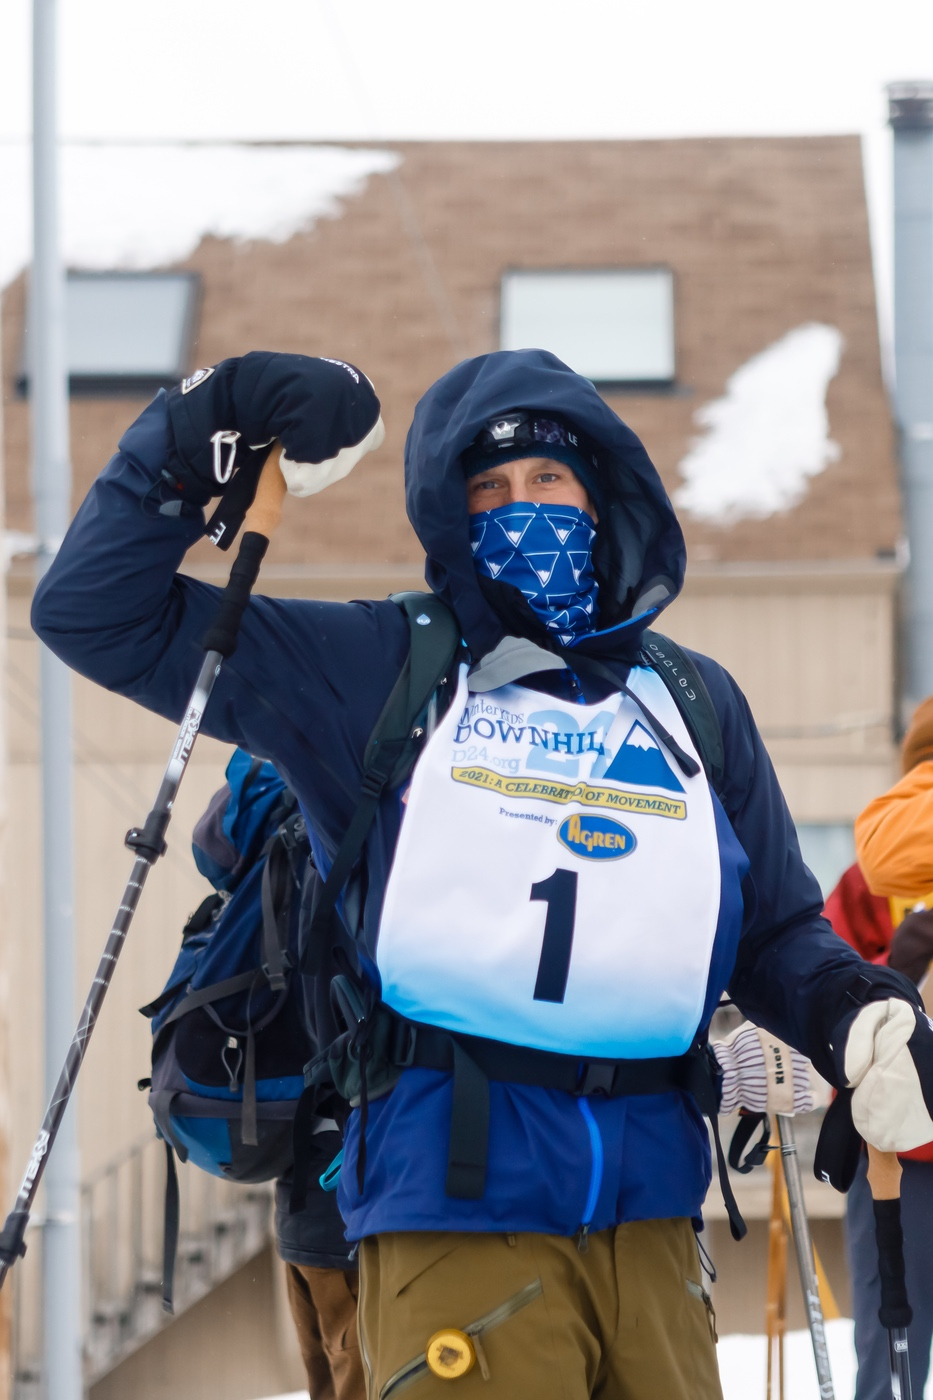 WinterKids Downhill 24 2021 SDP 3676